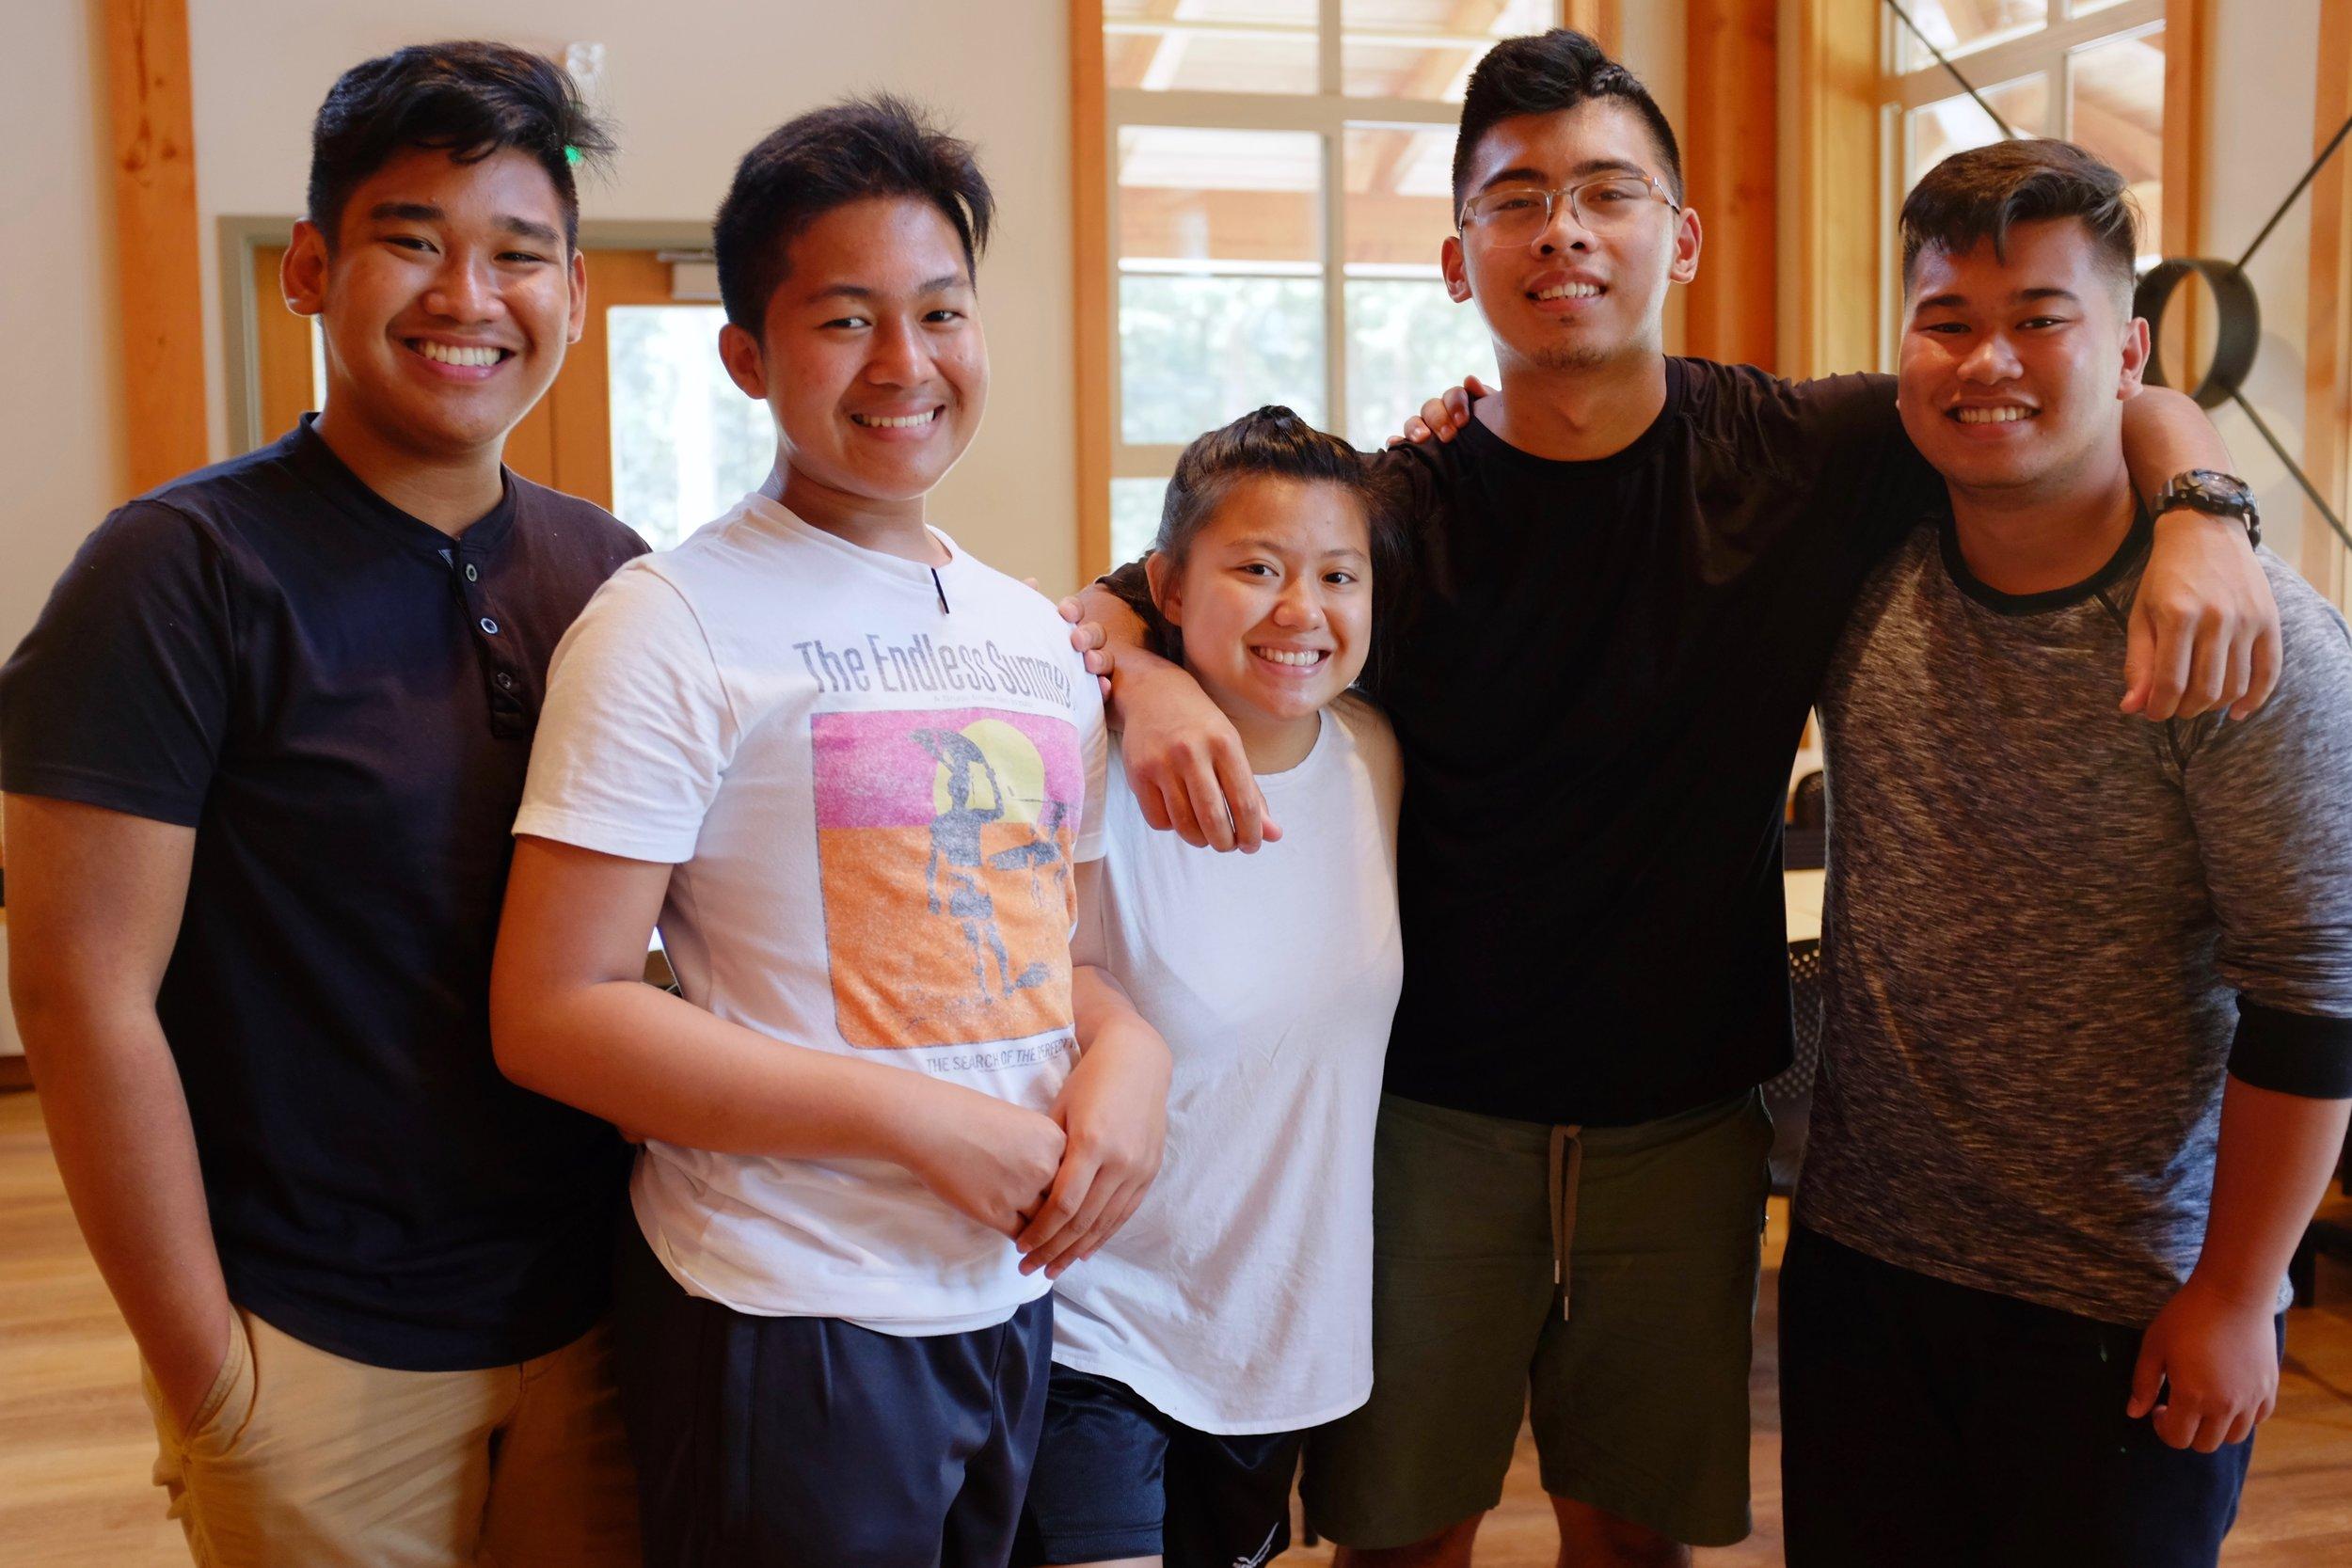 Torontonian Gino Amboang (left) with Jomar Calayan, Thea Melodias, M-jay Frias, and Mark Orayen. Photo by J. Austria.